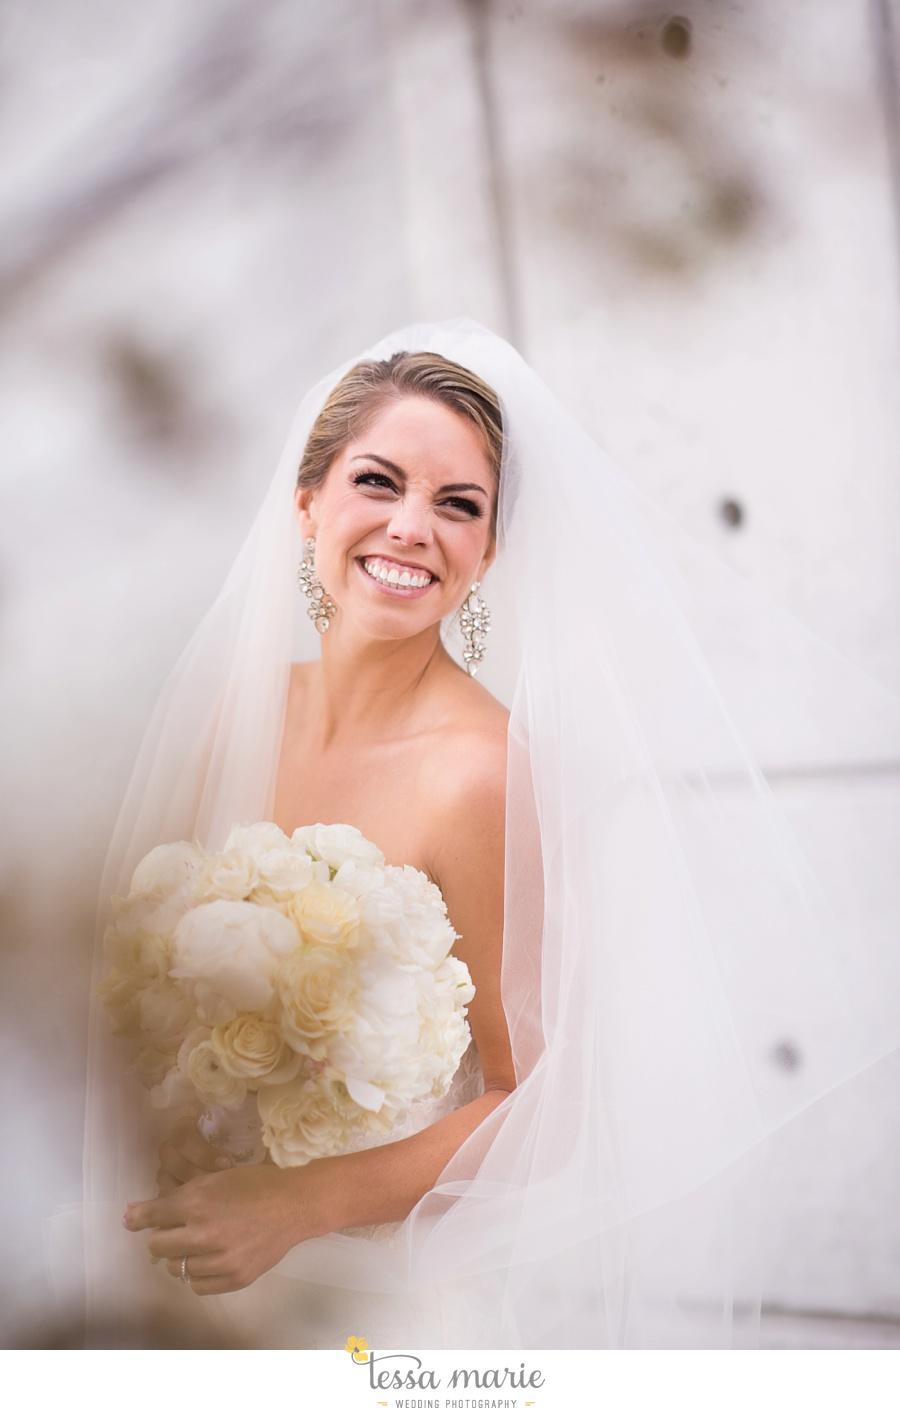 157_tessa_marie_weddings_emotional_moments_photography_king_low_wedding_sam_neil_best_atlanta_wedding_photographer